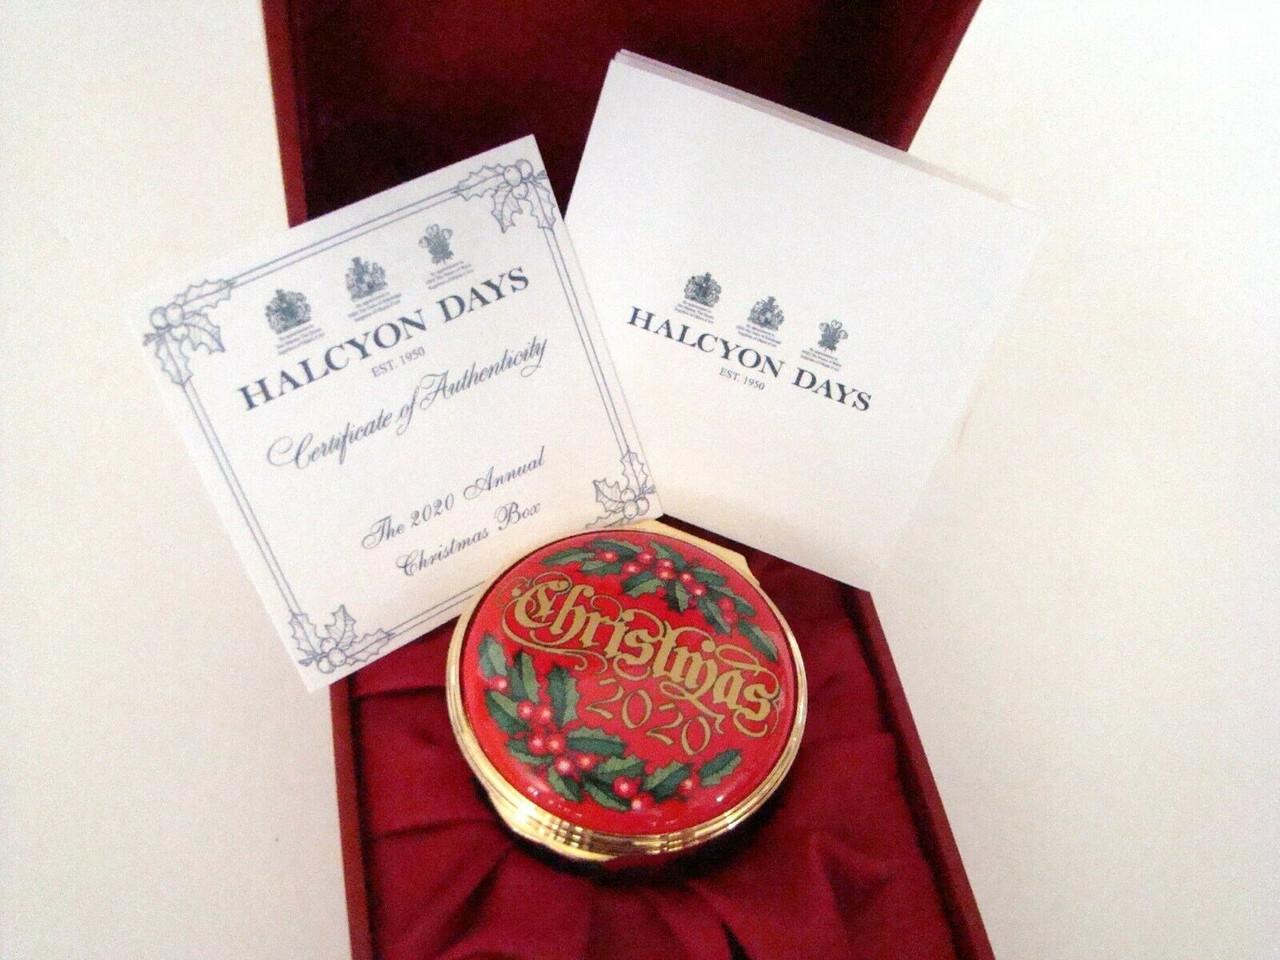 Halcyon Days 2020 47th Annual Christmas Box ENCH200101G